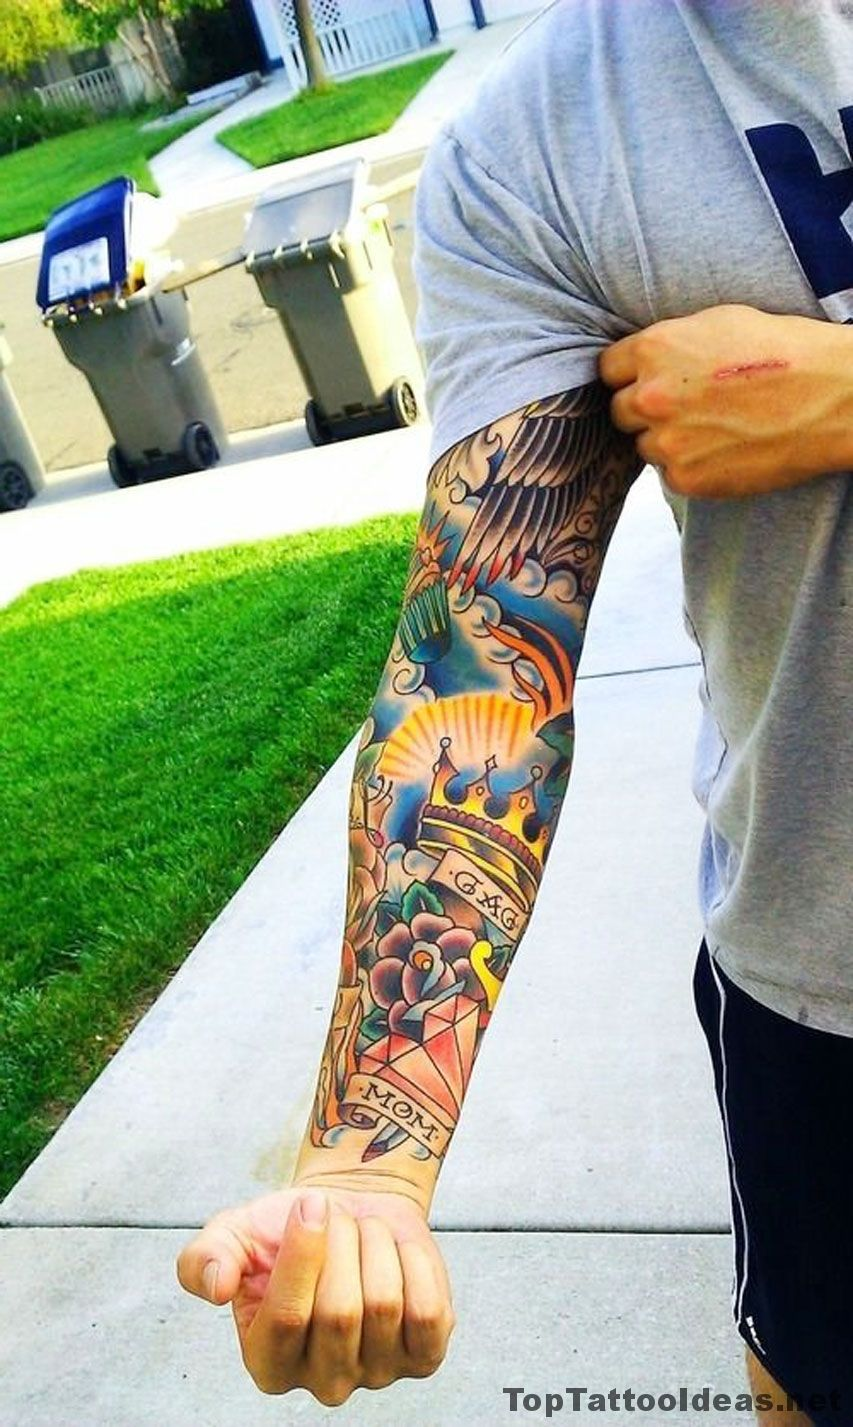 Classy Inked Colourful Arm Tattoo Idea Top Tattoo Ideas Arm Tattoo Traditional Tattoo Sleeve Best Sleeve Tattoos